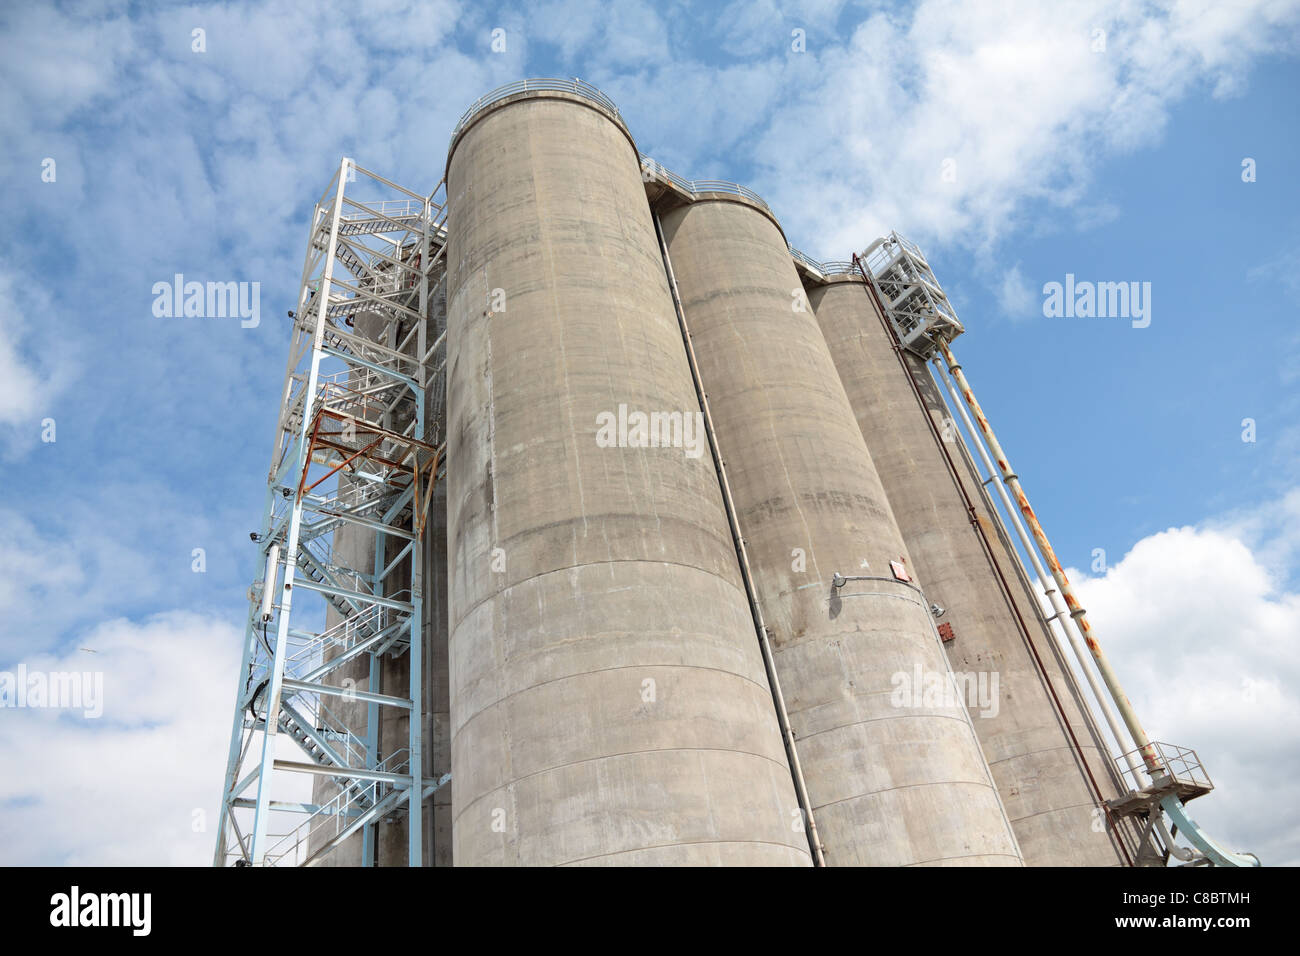 Tanks and Metal Stair - Stock Image